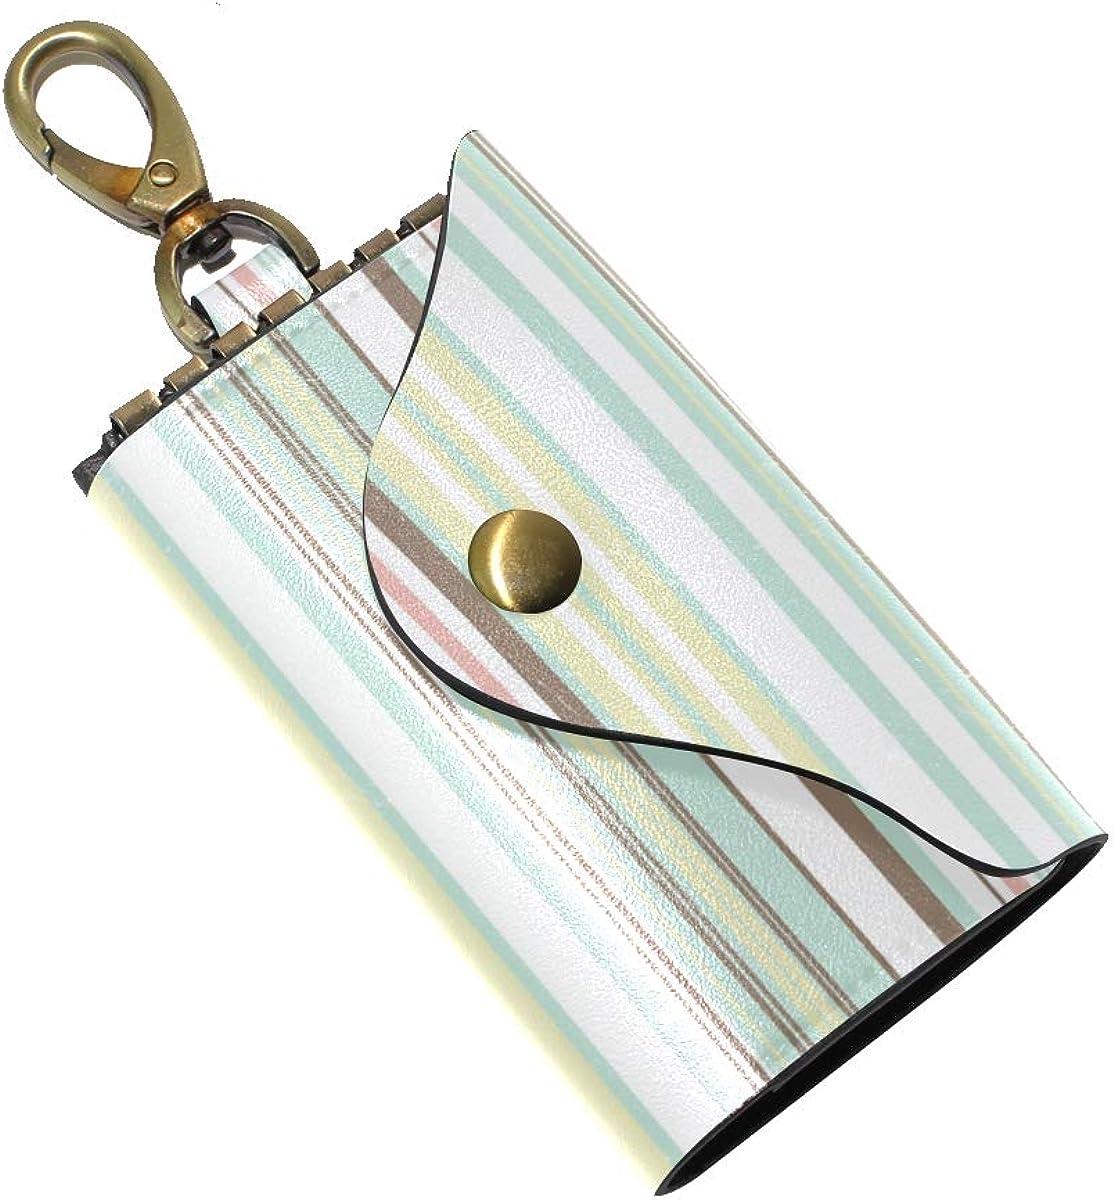 KEAKIA Fox Leather Key Case Wallets Tri-fold Key Holder Keychains with 6 Hooks 2 Slot Snap Closure for Men Women